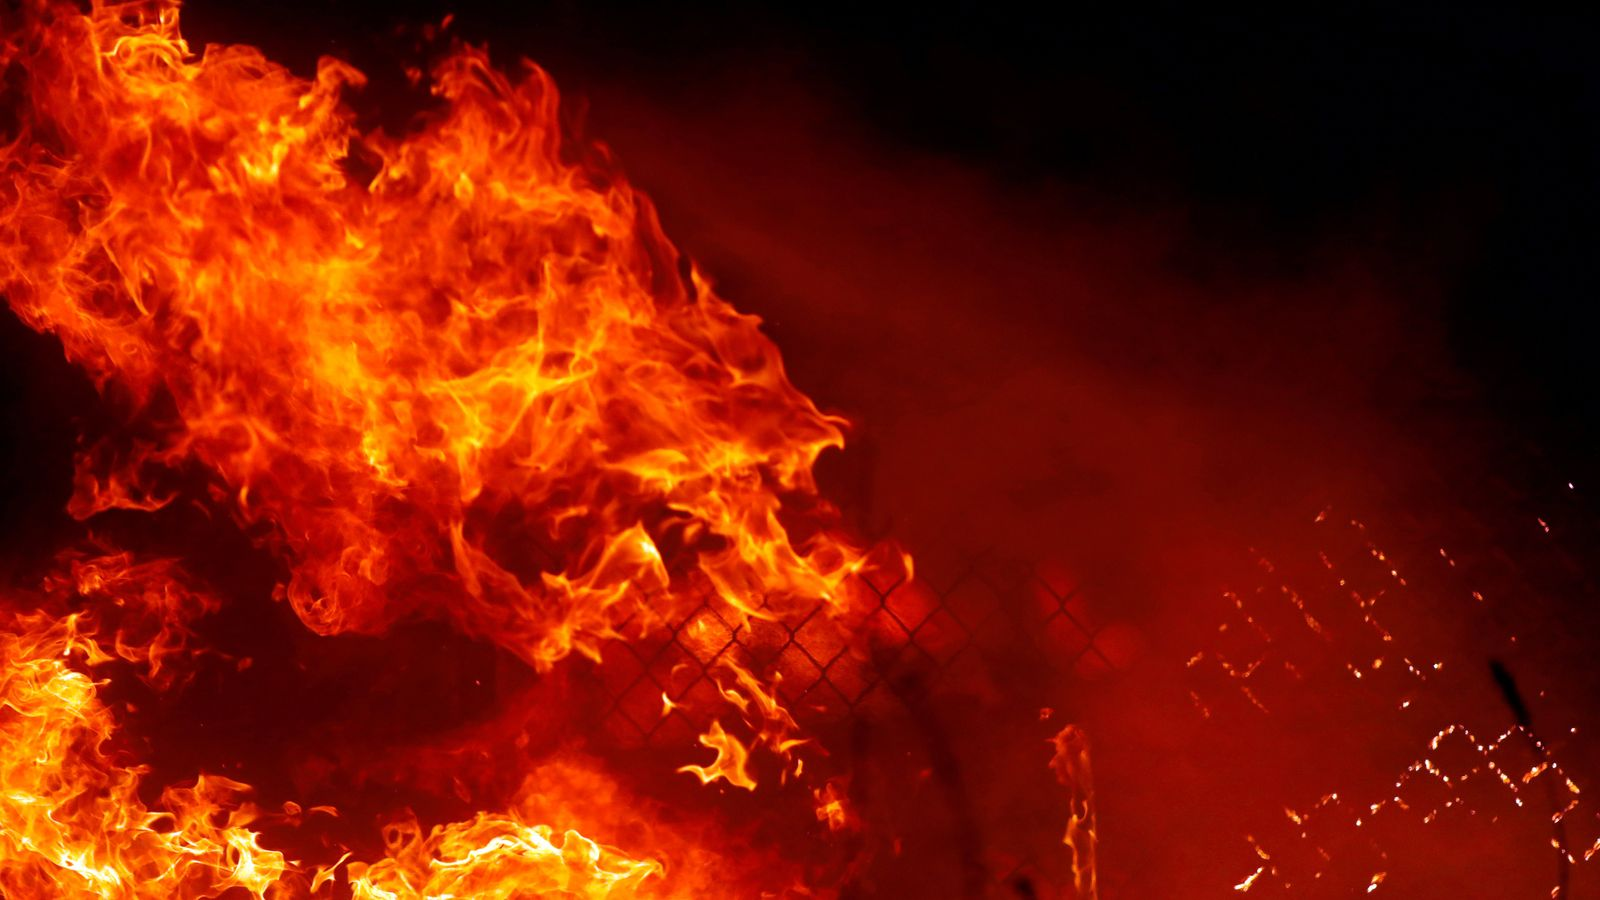 california wildfires devastation and destruction in pictures us news sky news. Black Bedroom Furniture Sets. Home Design Ideas